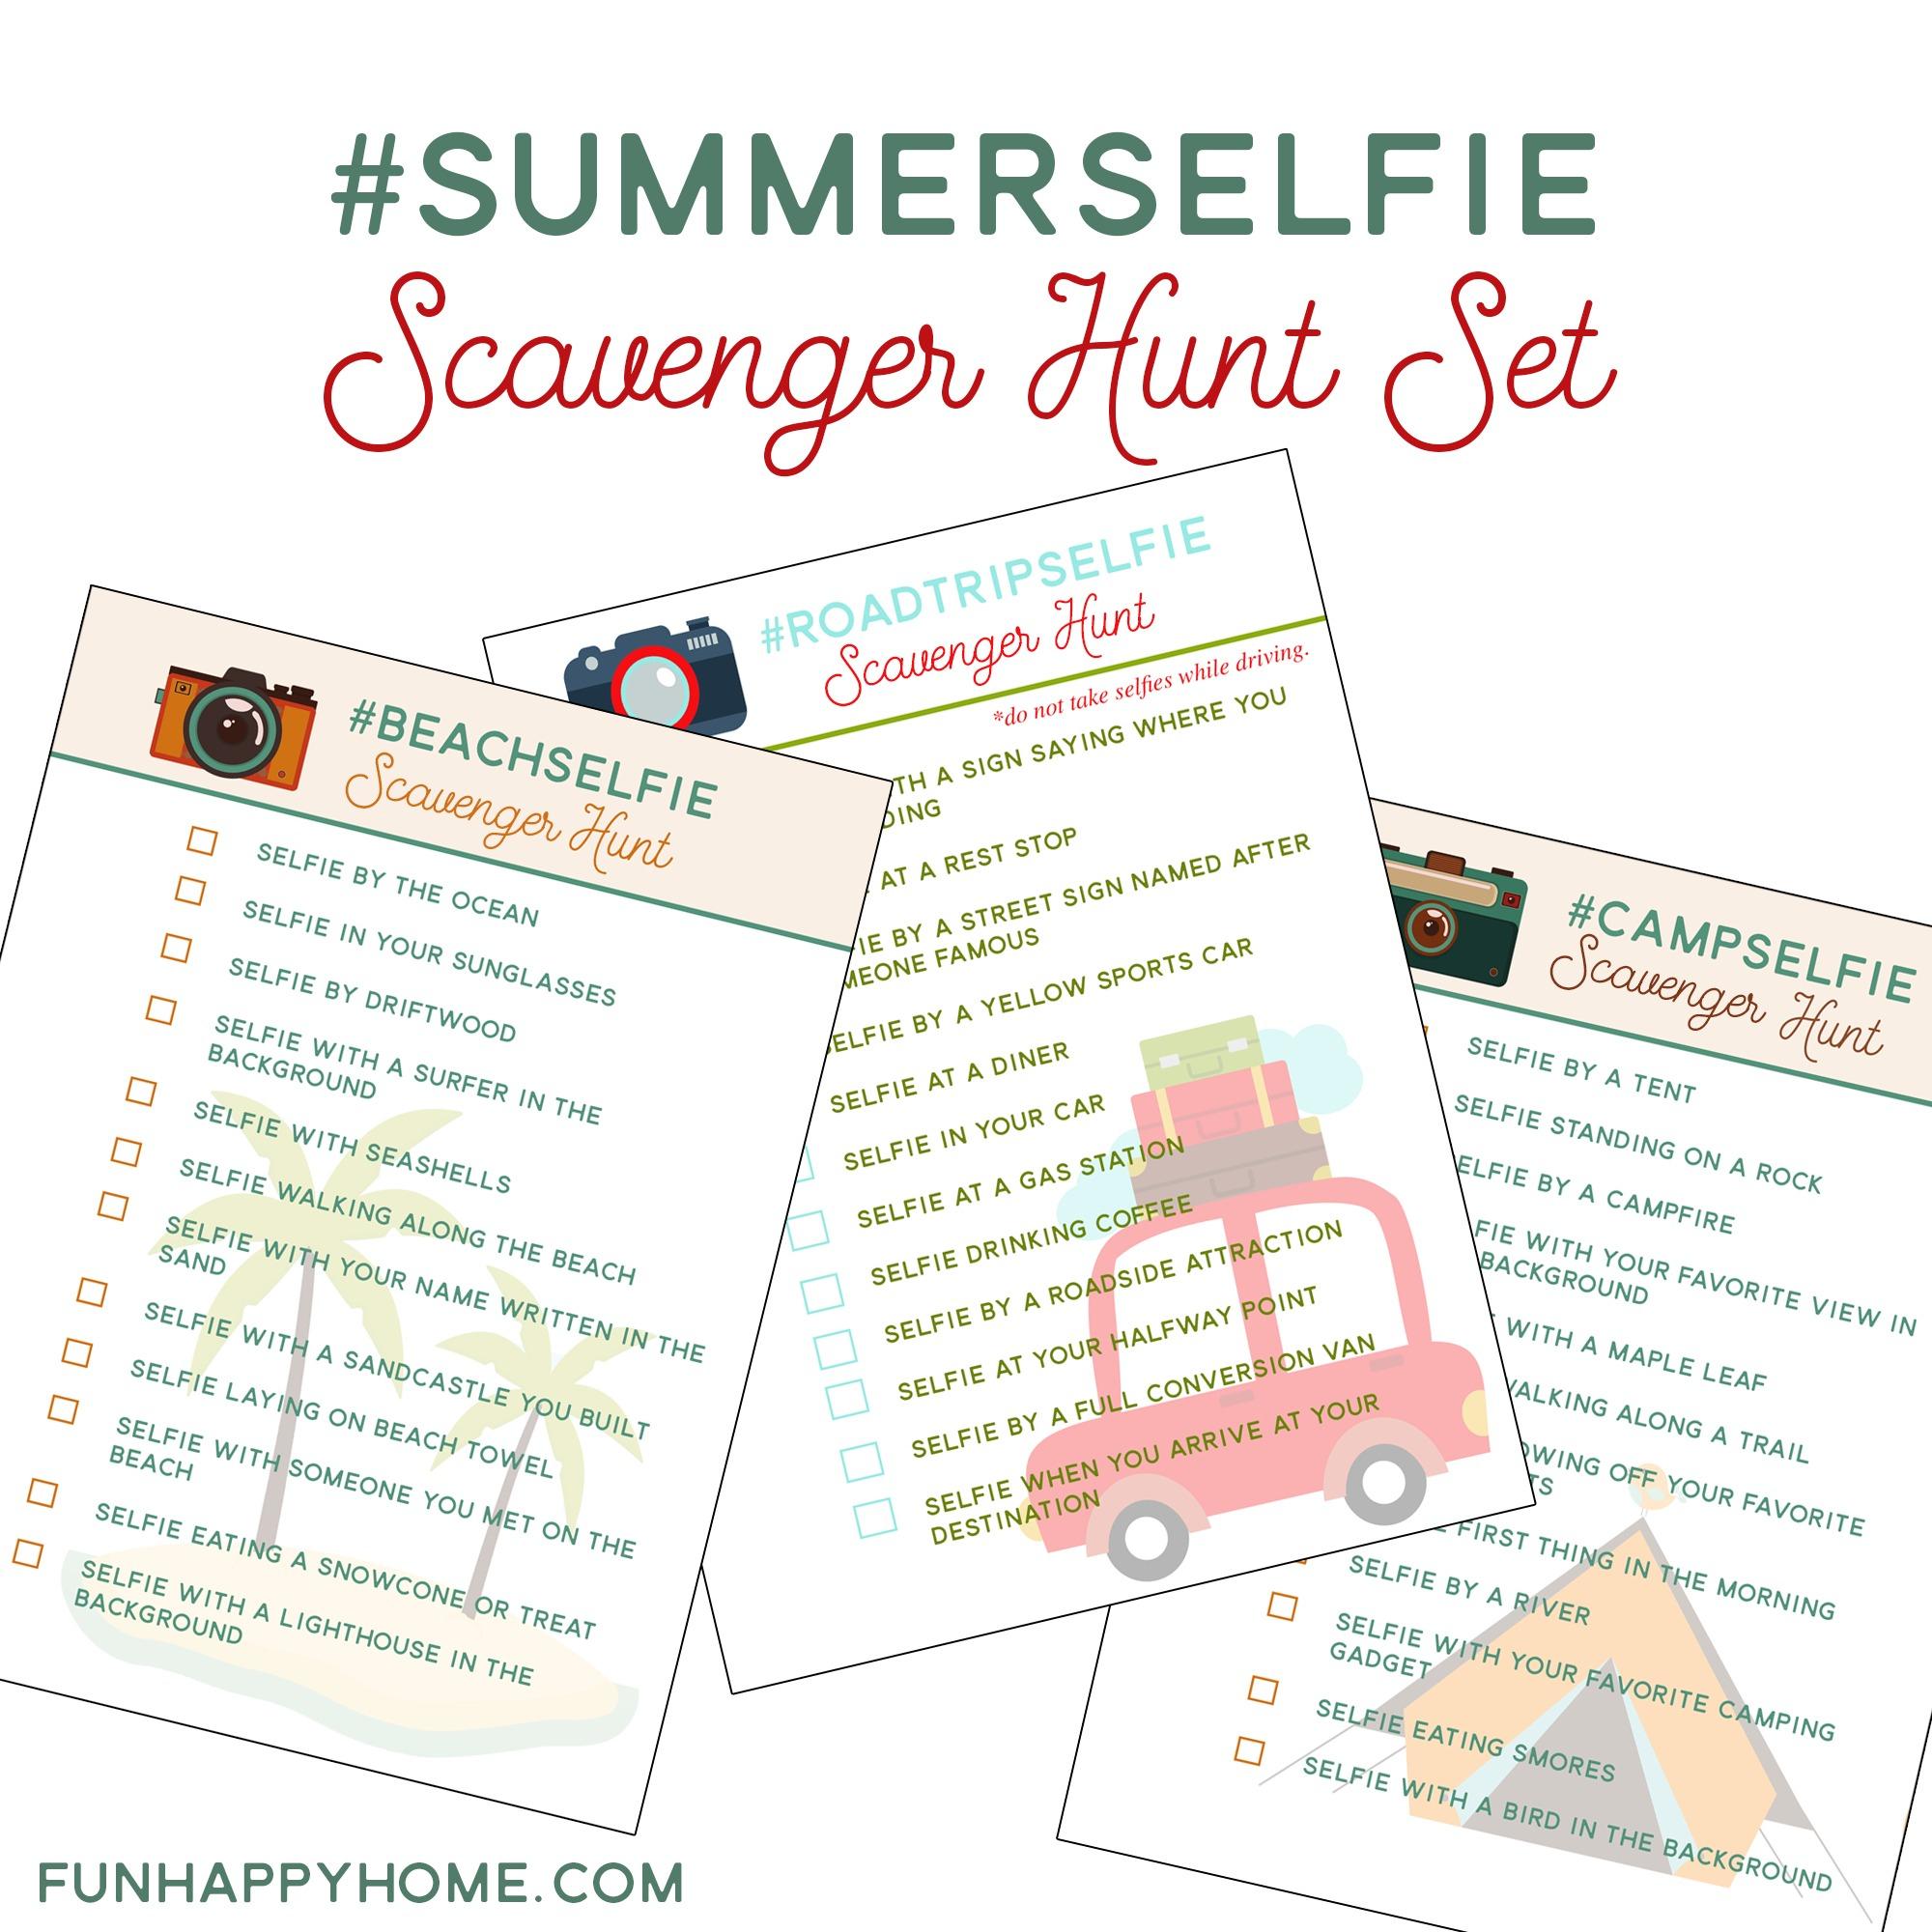 Summerselfie Scavenger Hunt {And Free Printables} - Fun Happy Home - Free Printable Scavenger Hunt